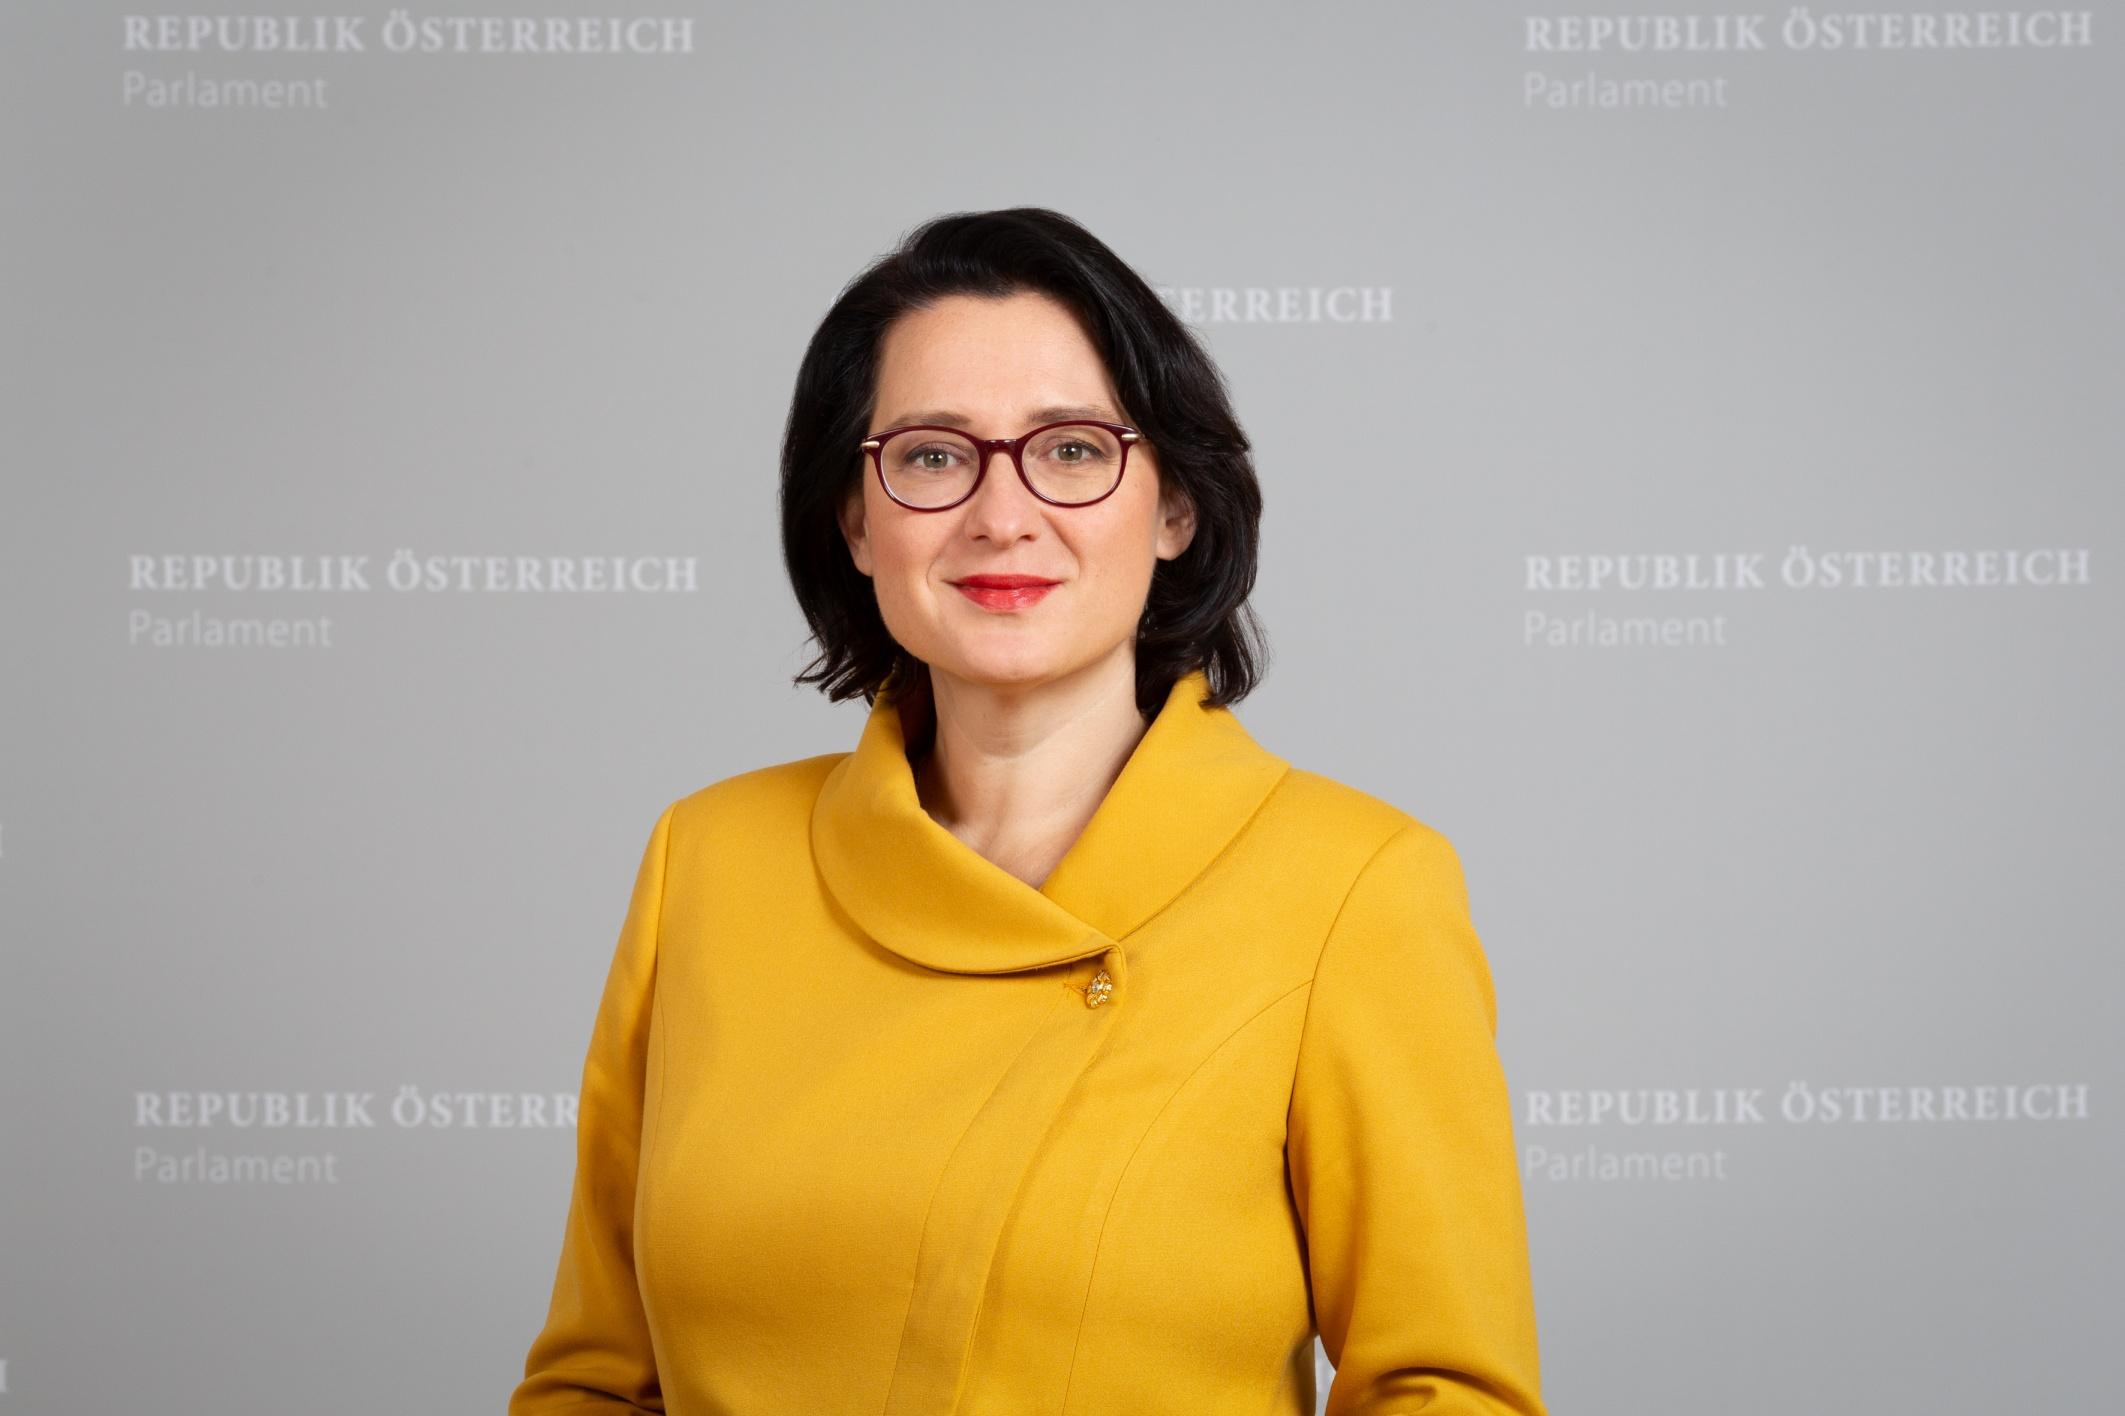 Gudrun Kugler, Foto: Parlamentsdirektion / Simonis